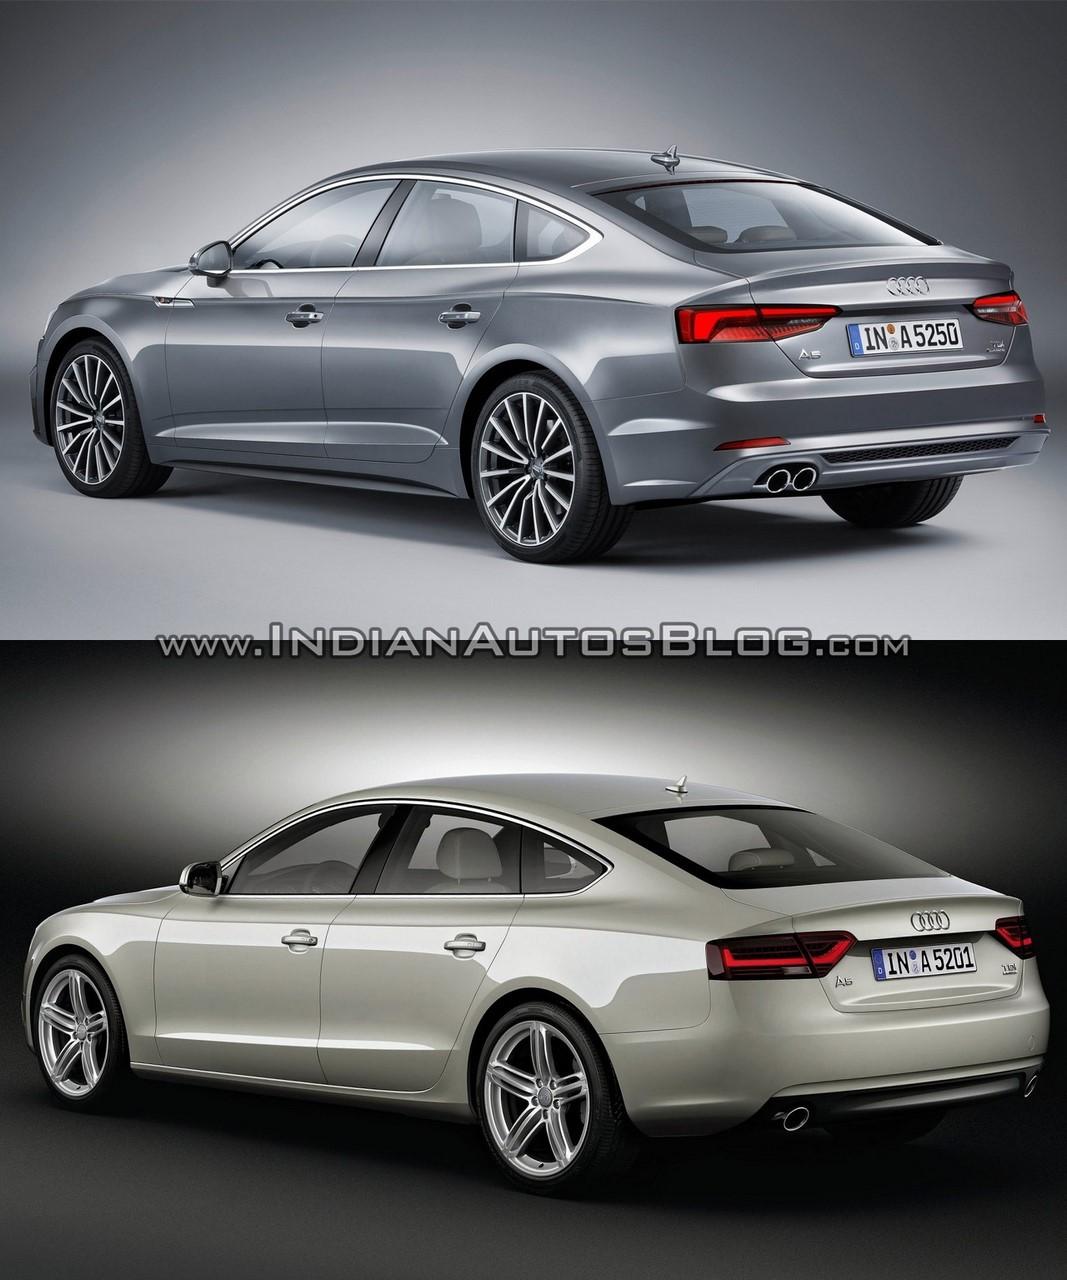 2017 Audi A5 Sportback Vs. 2012 Audi A5 Sportback Rear